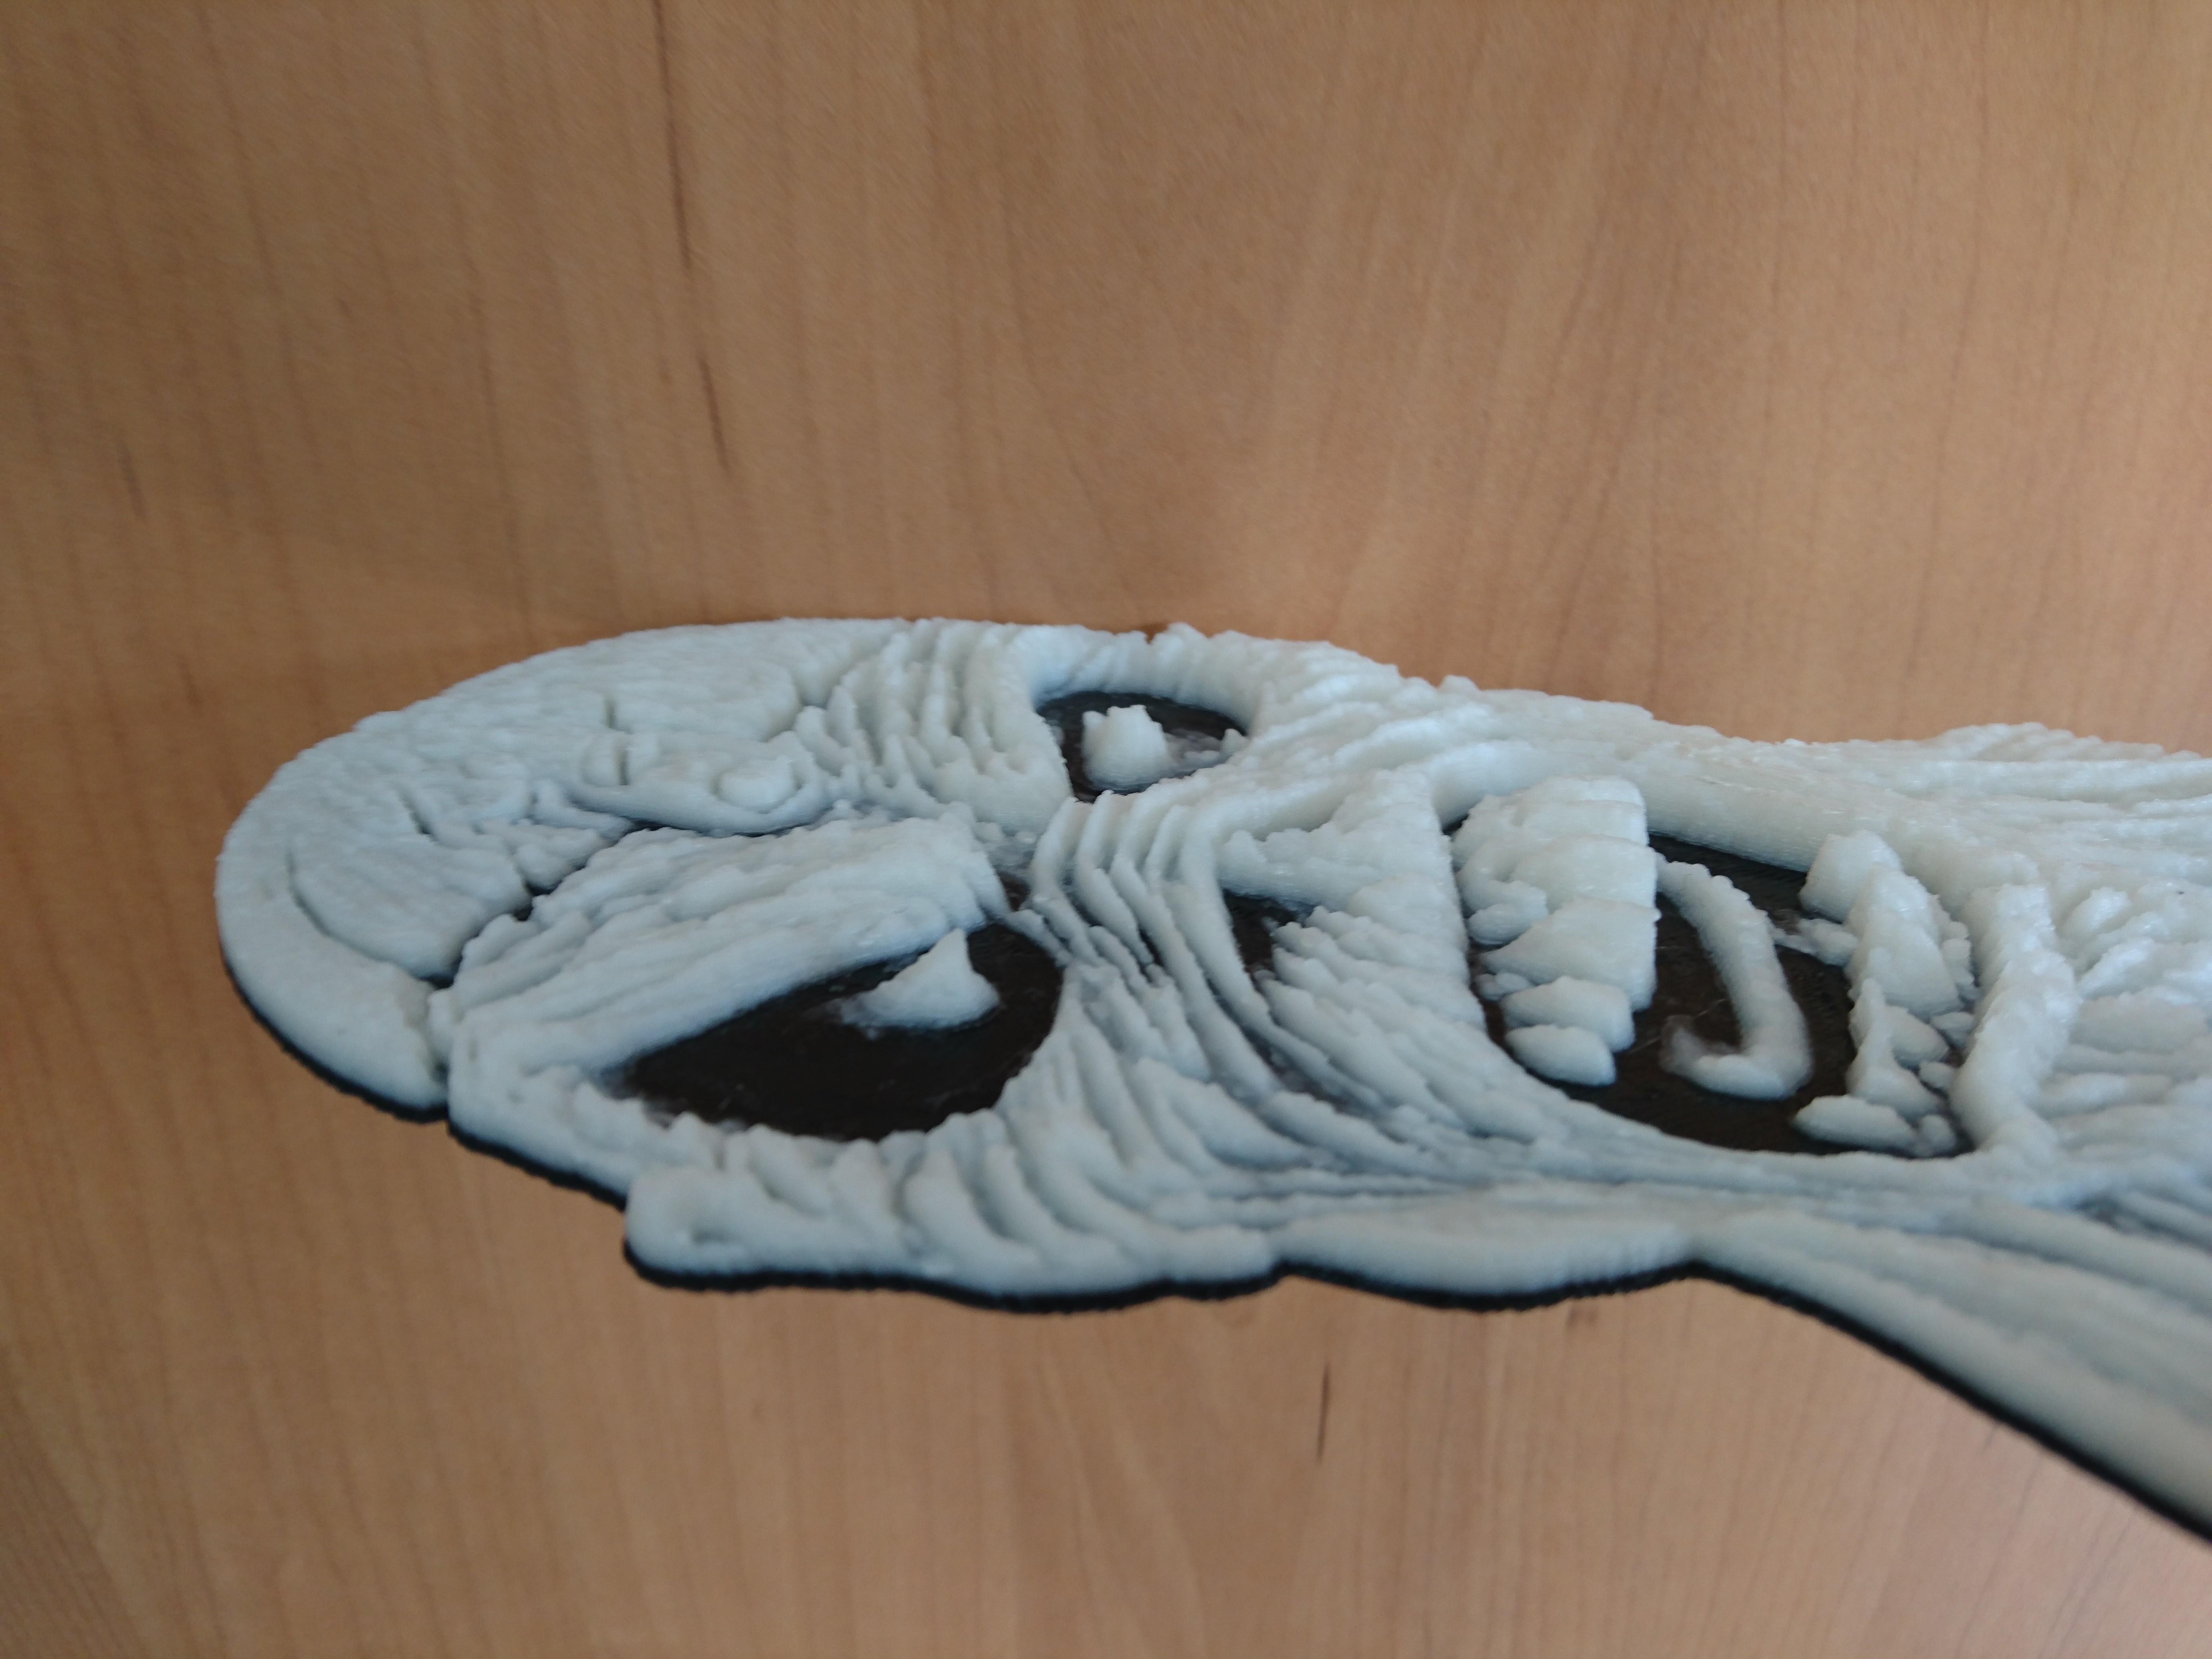 DSC_0410.JPG Download free STL file DRAWING 3D eddie (IRON MAIDEN) ... 3D DRAWING ..... • 3D print model, 3dlito